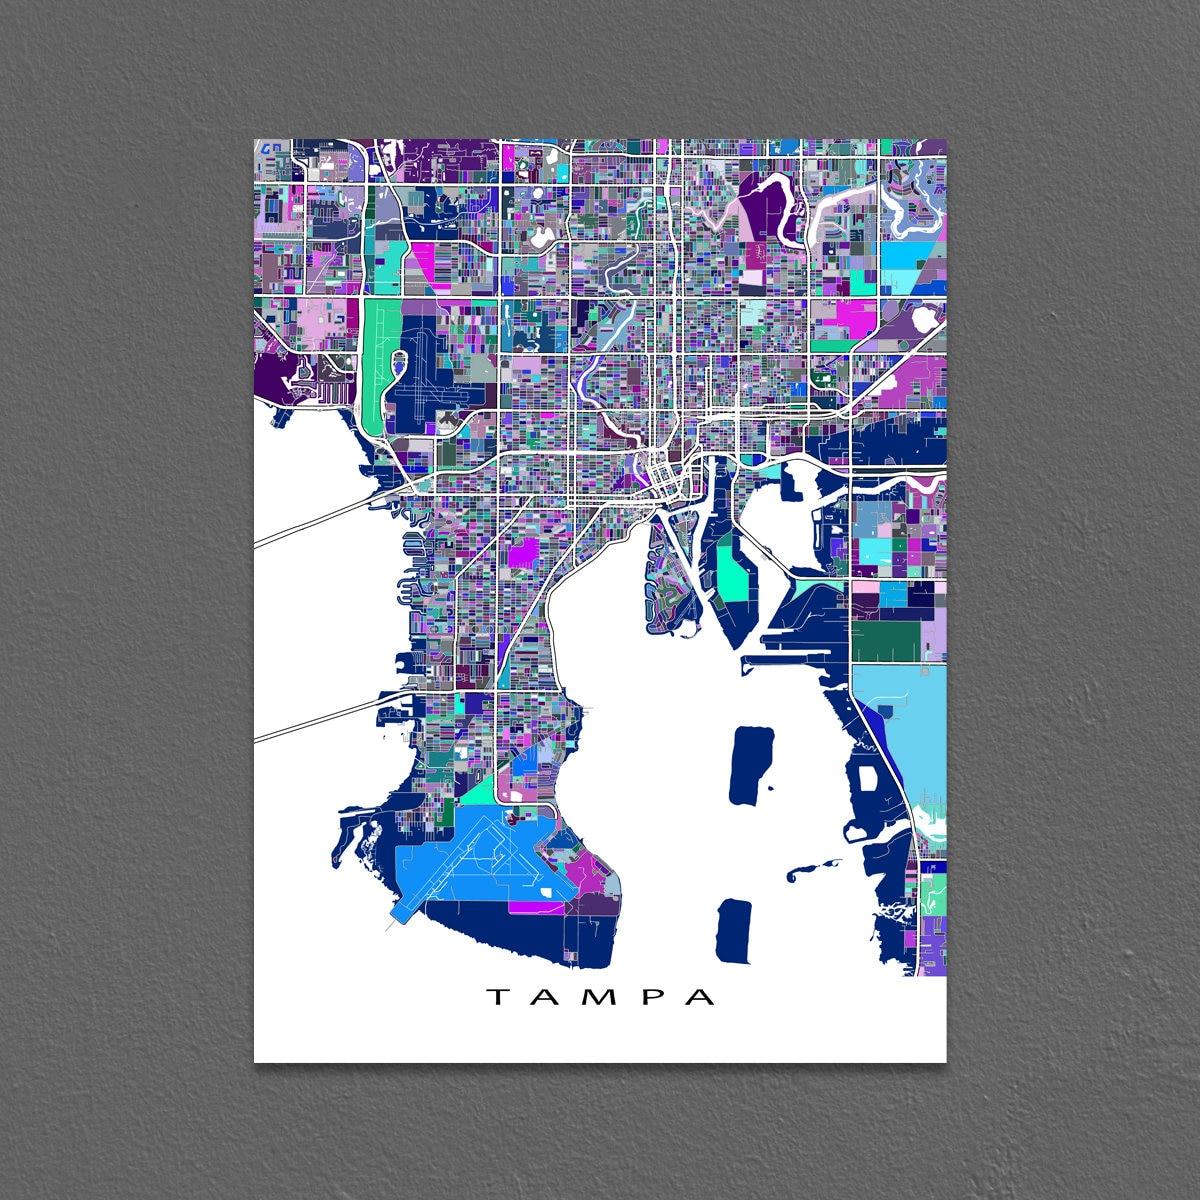 tampa map print tampa florida city map art street maps etsy. Black Bedroom Furniture Sets. Home Design Ideas